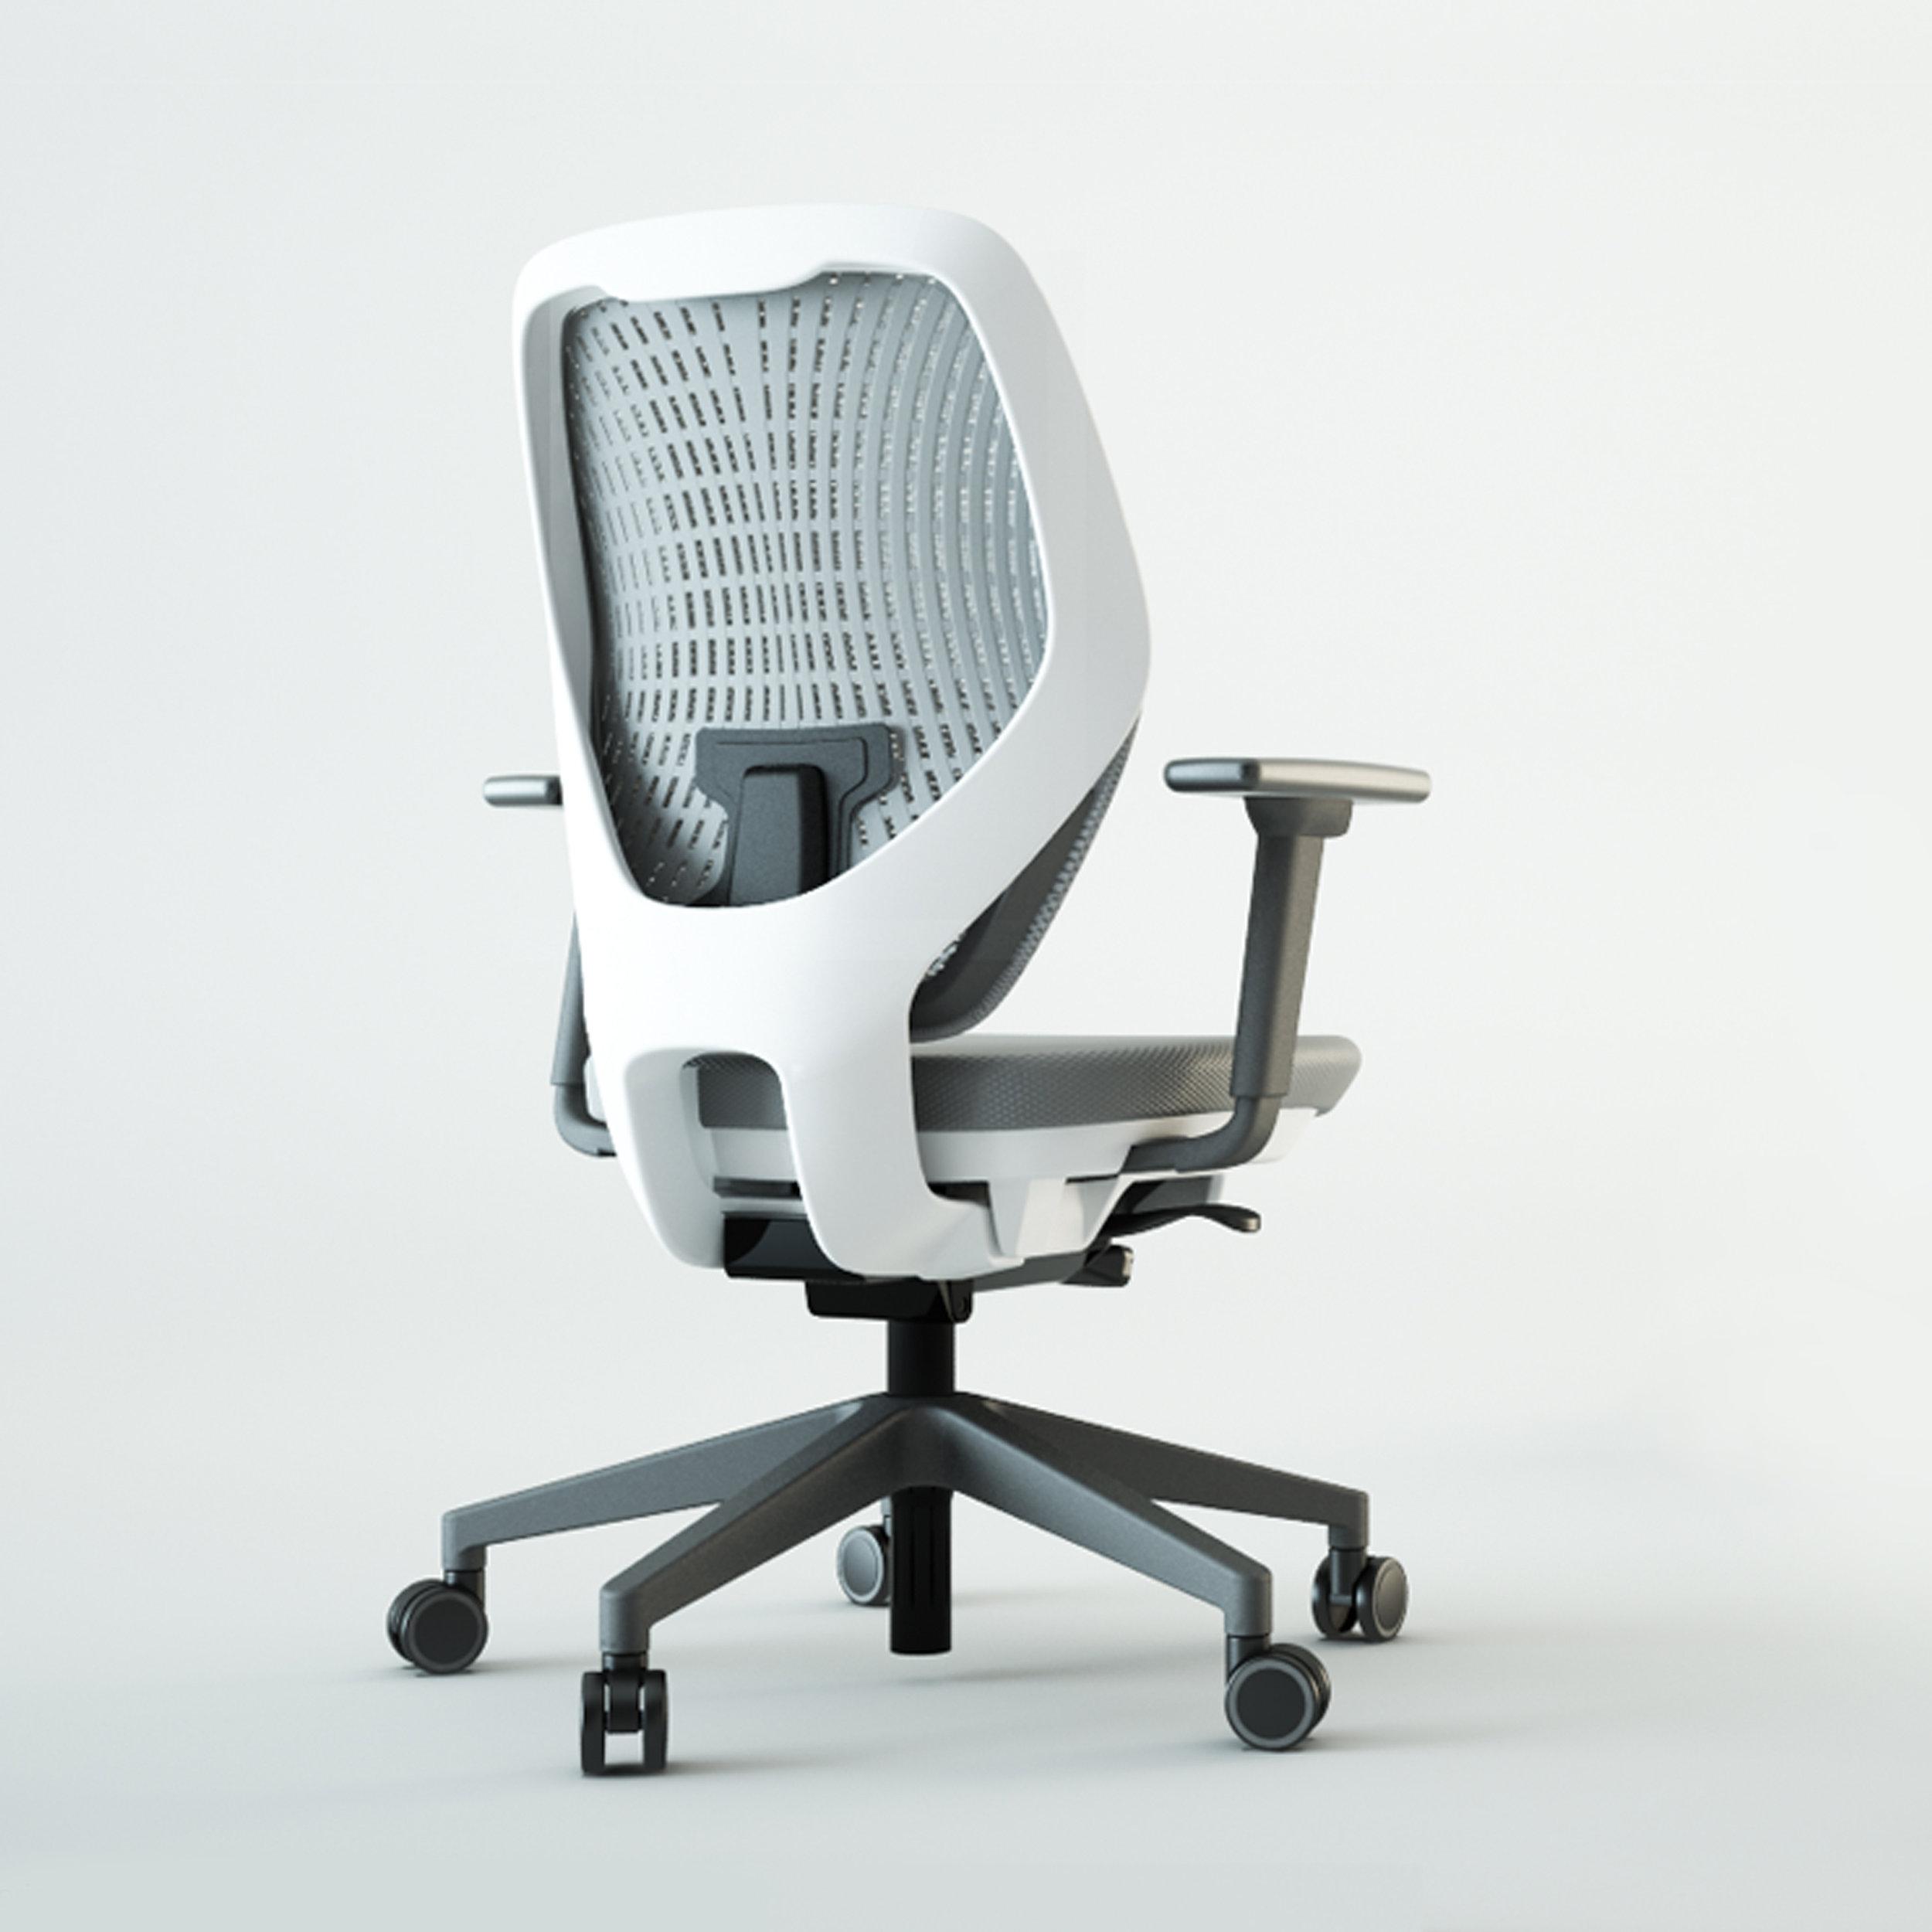 Ingo Chair